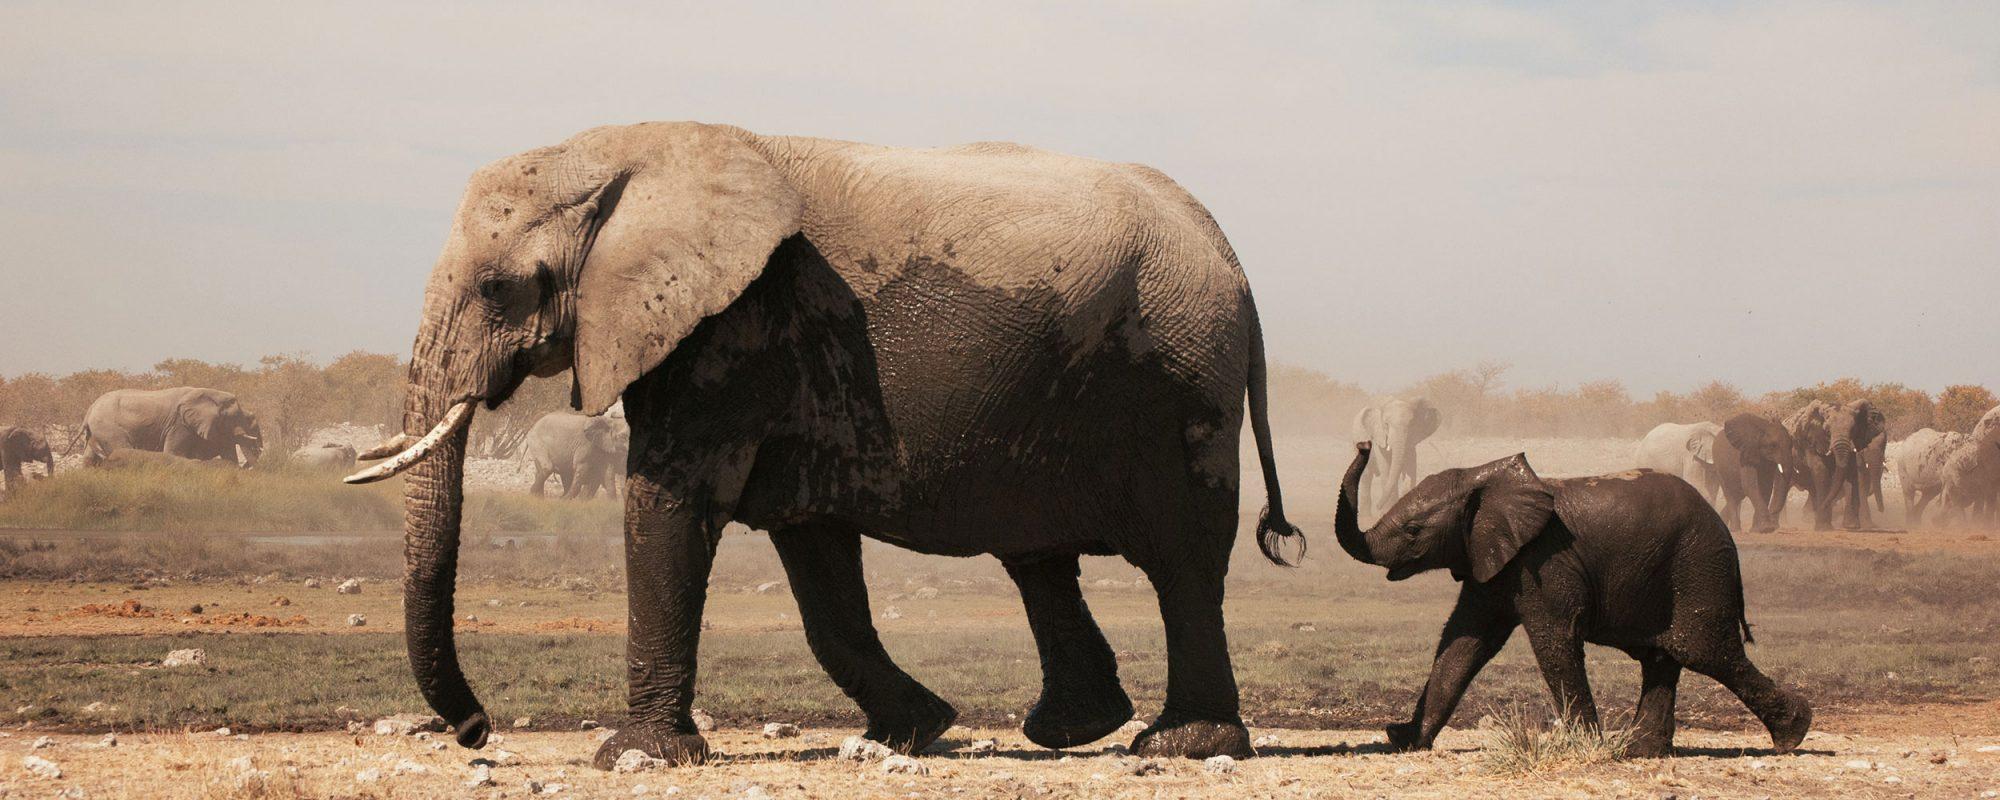 amiga-imagine-elephants-big